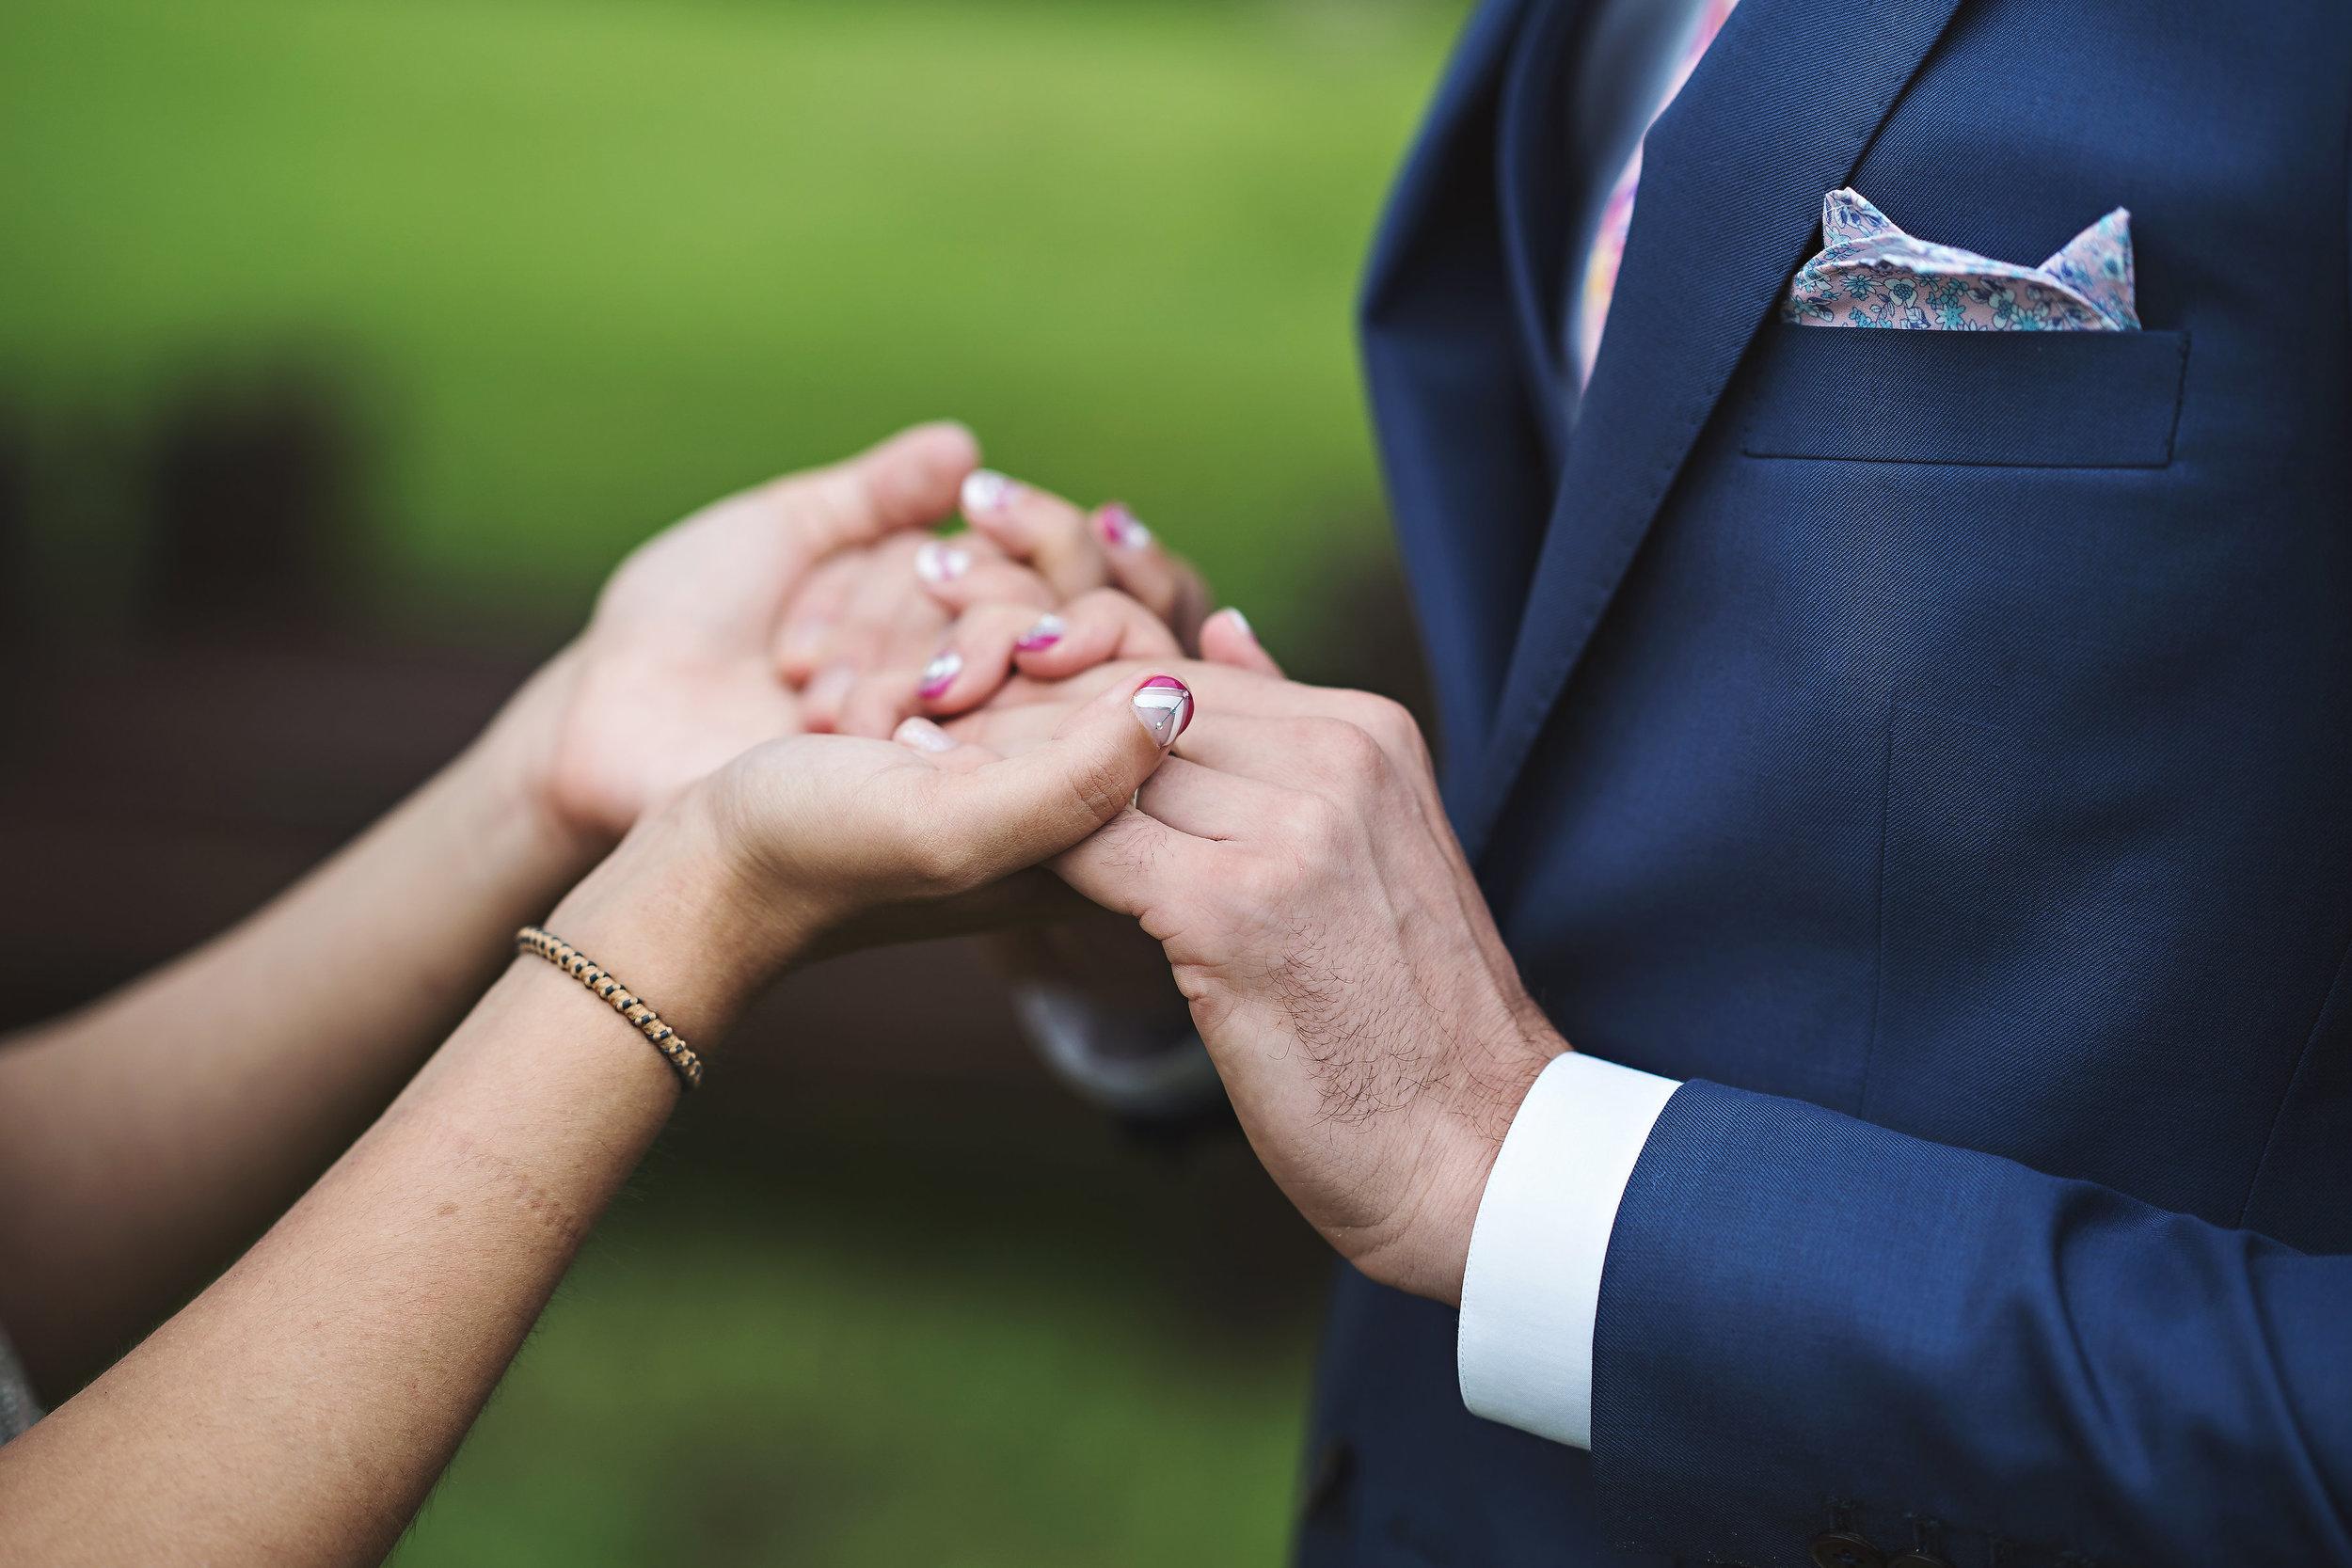 upstate-ny-wedding-jove-meyer-events-inbal-sivan-067.jpg